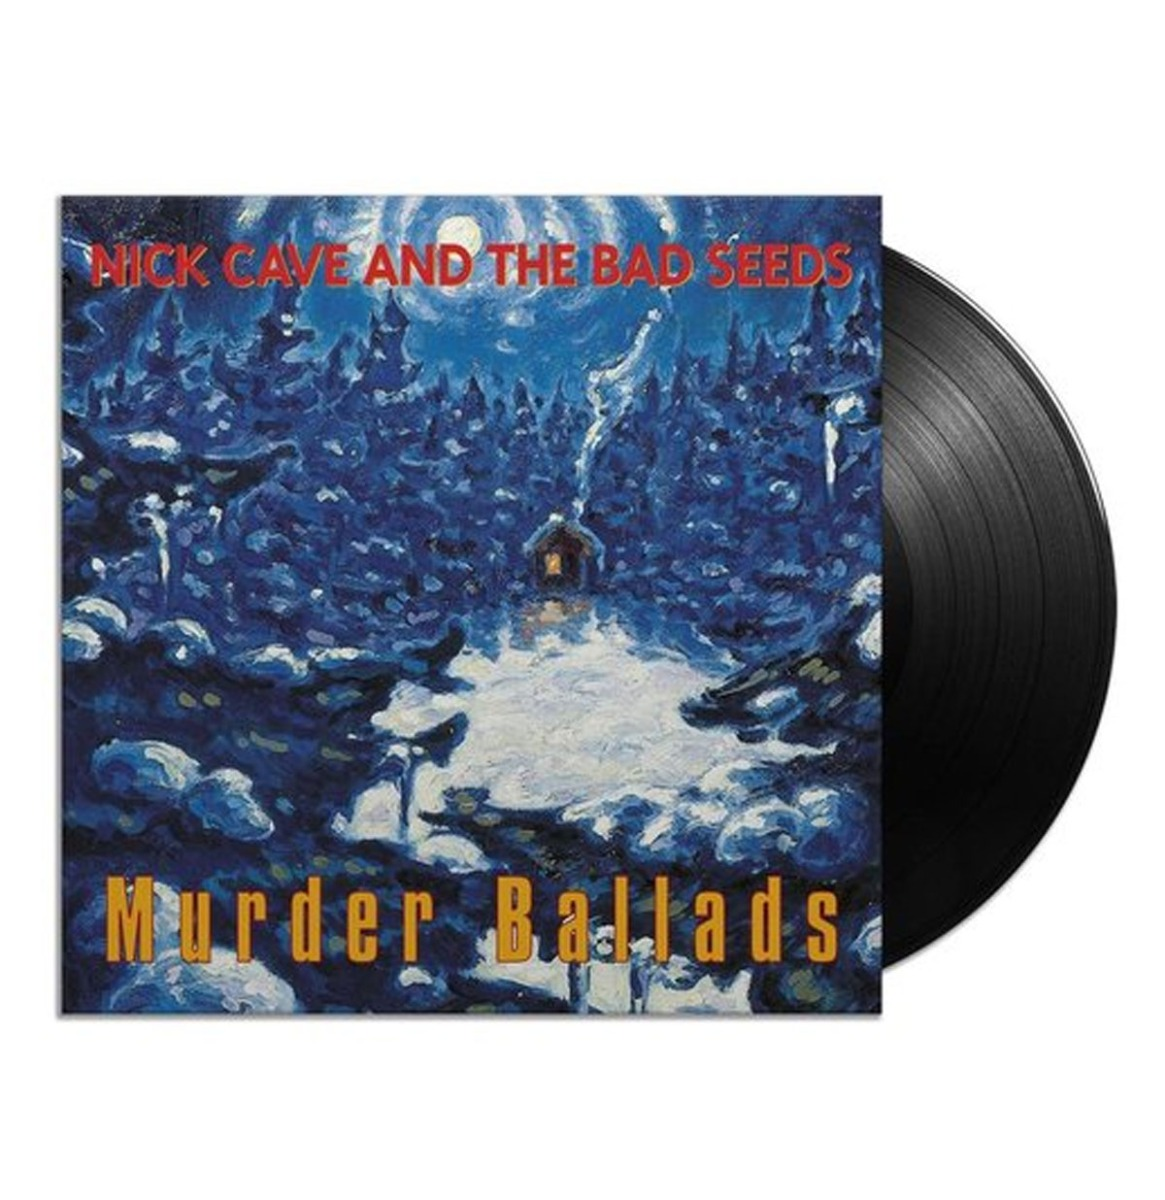 Nick Cave & The Bad Seeds - Murder Ballads LP